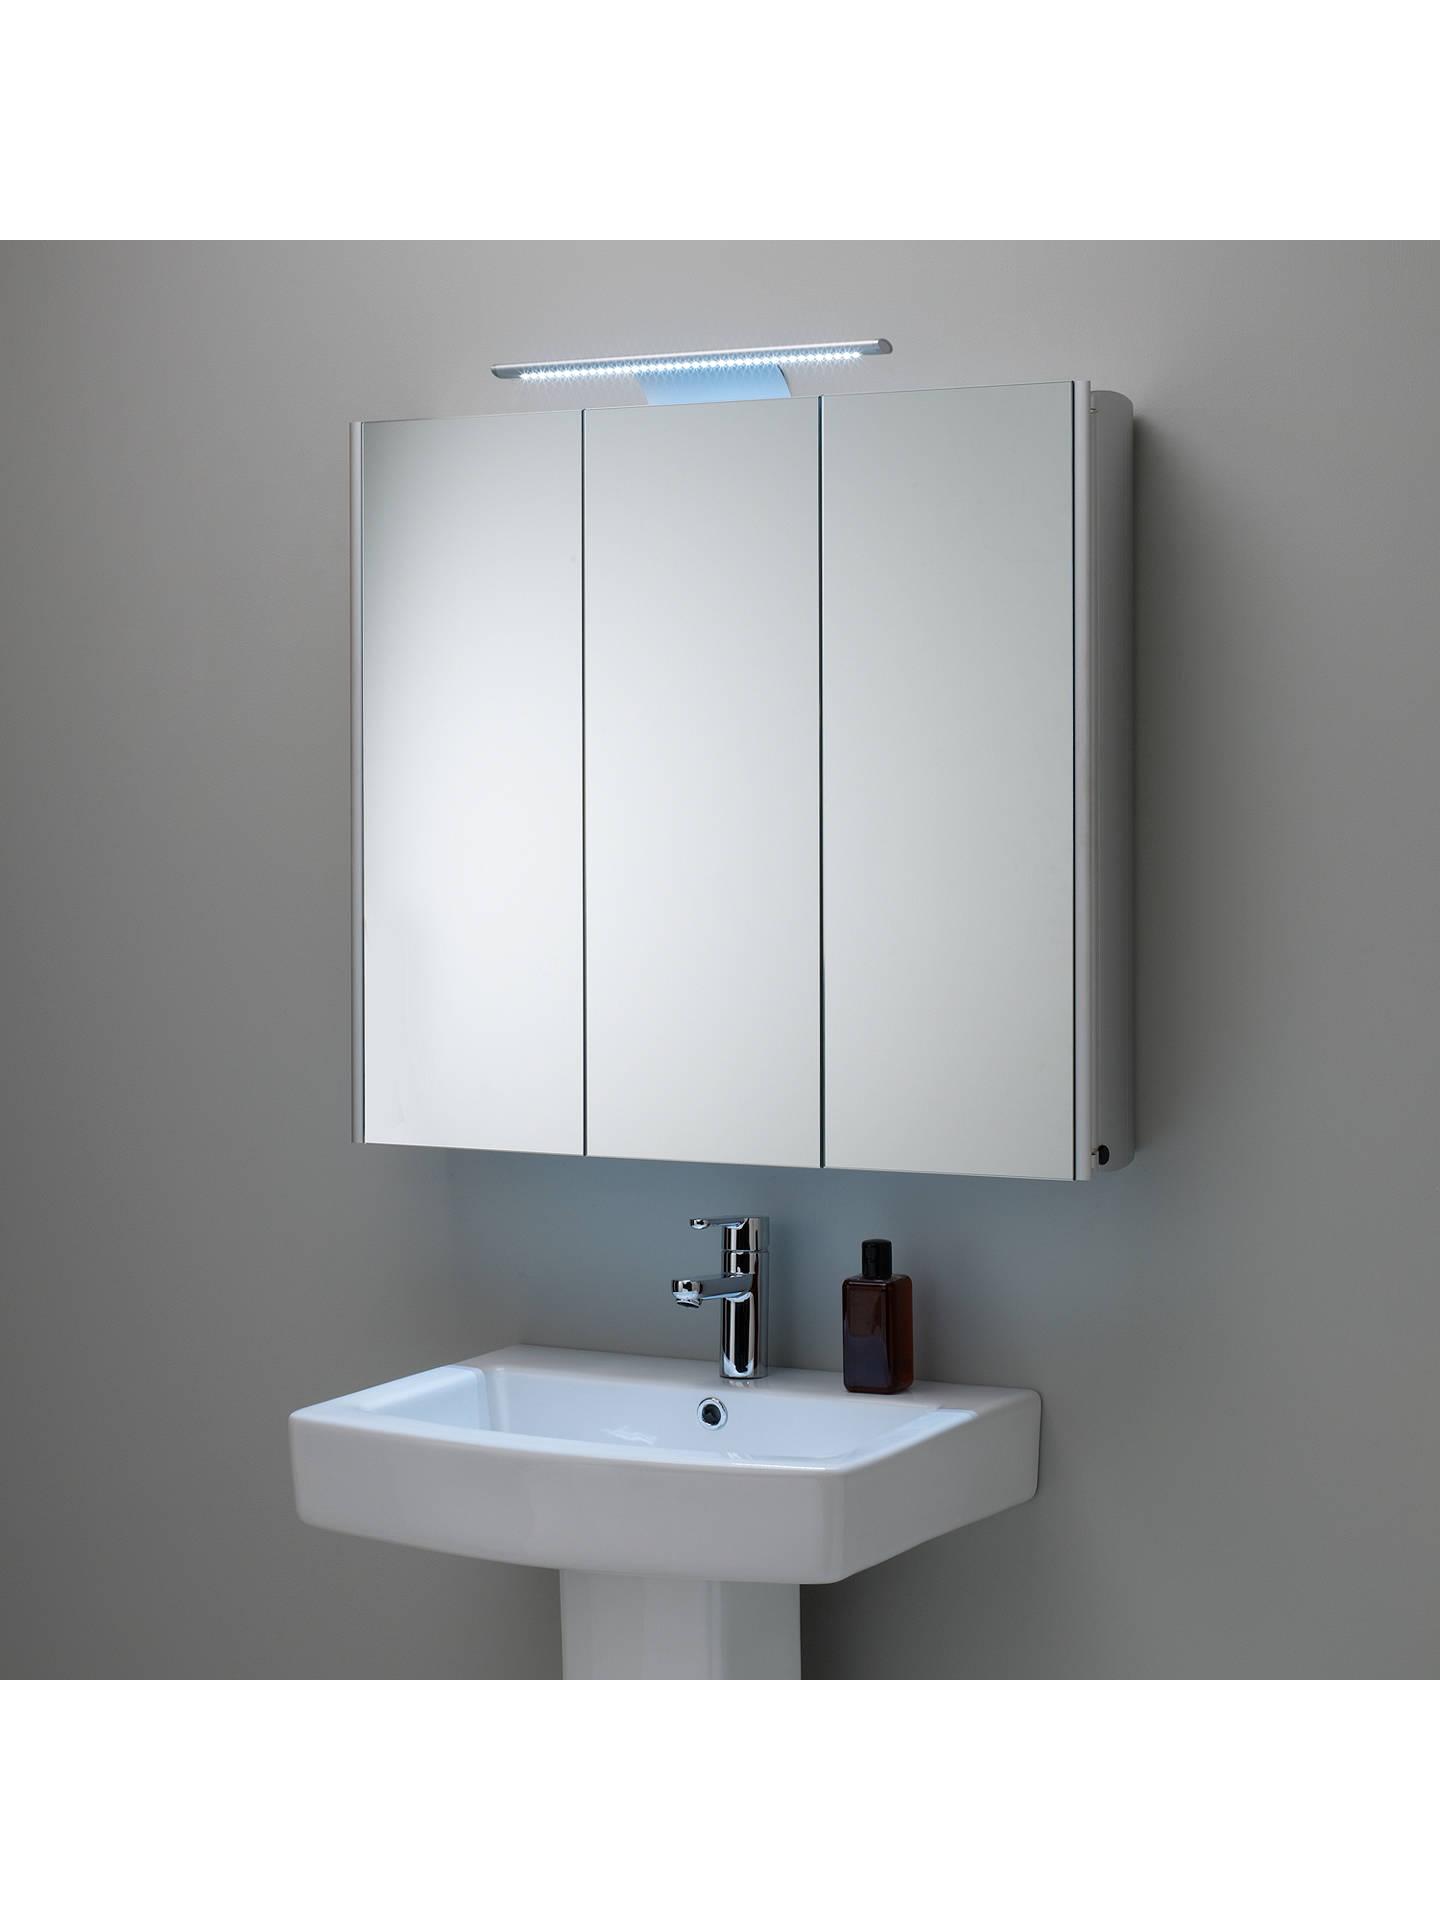 Roper Rhodes Absolute Triple Mirrored Illuminated Bathroom Cabinet Online At Johnlewis